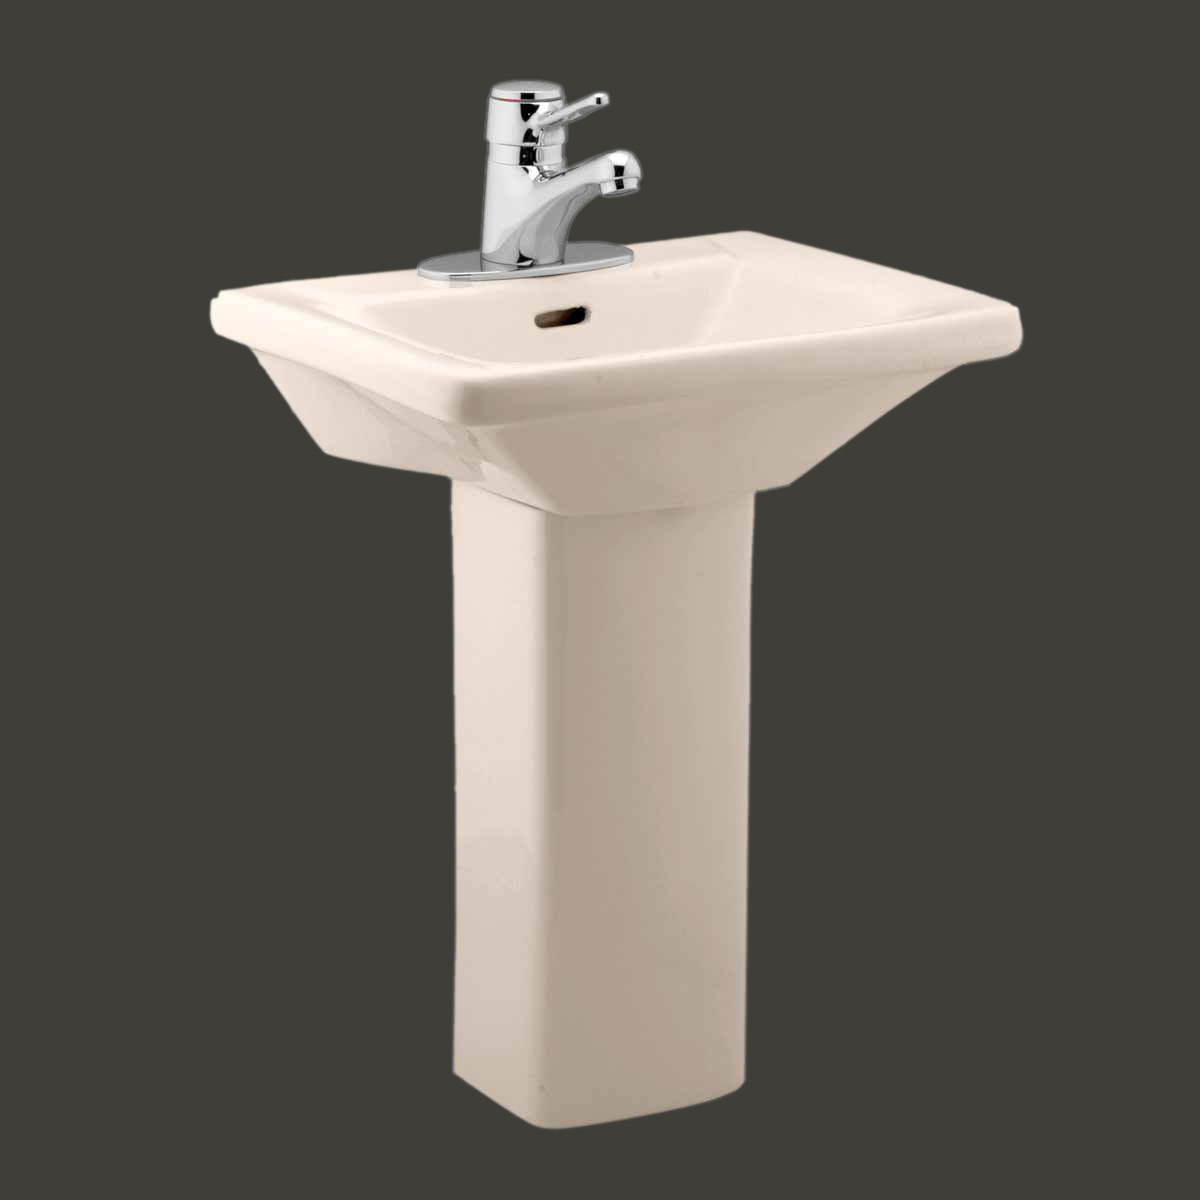 Pedestal Sink Cheap : Childrens Bathroom Pedestal Sink Bone China Wash Station